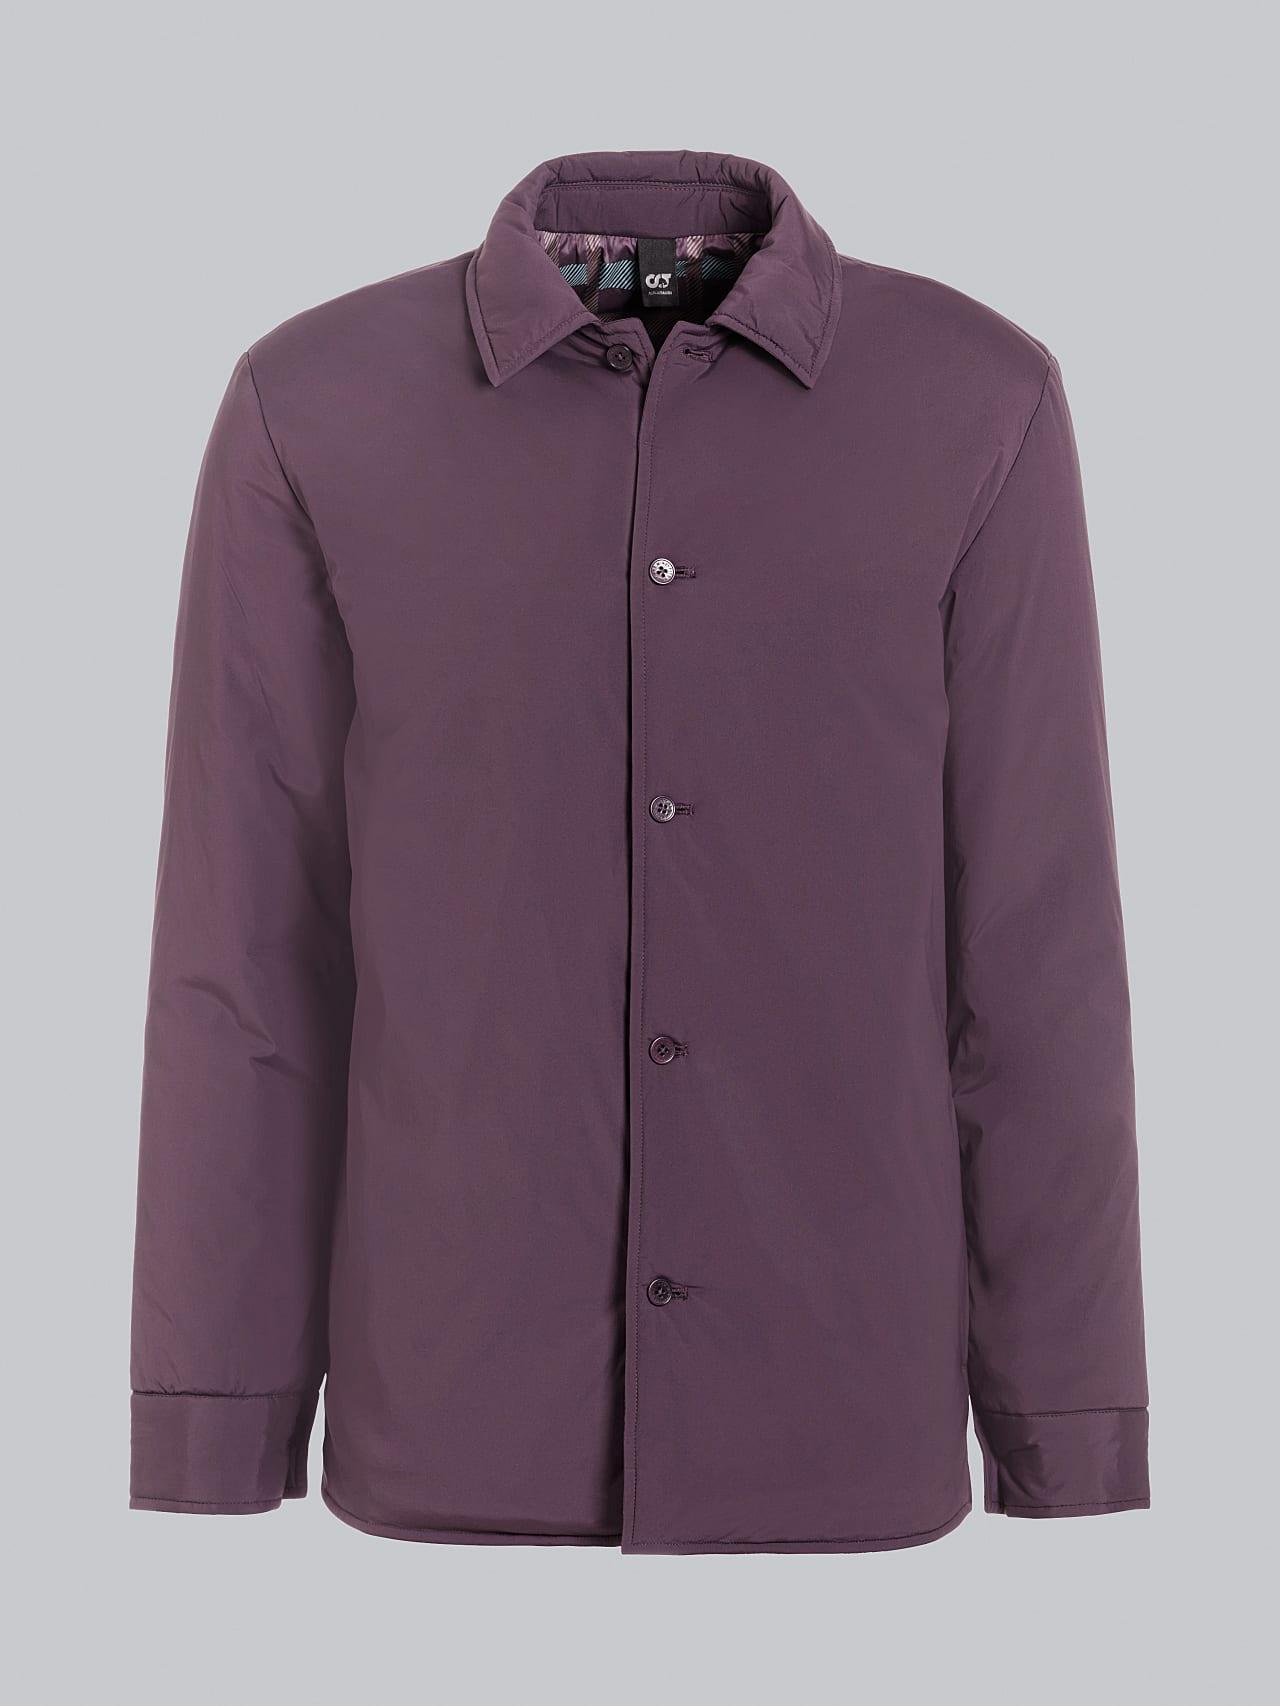 OVASU V1.Y5.02 PrimaLoft® Overshirt Jacket Burgundy Back Alpha Tauri